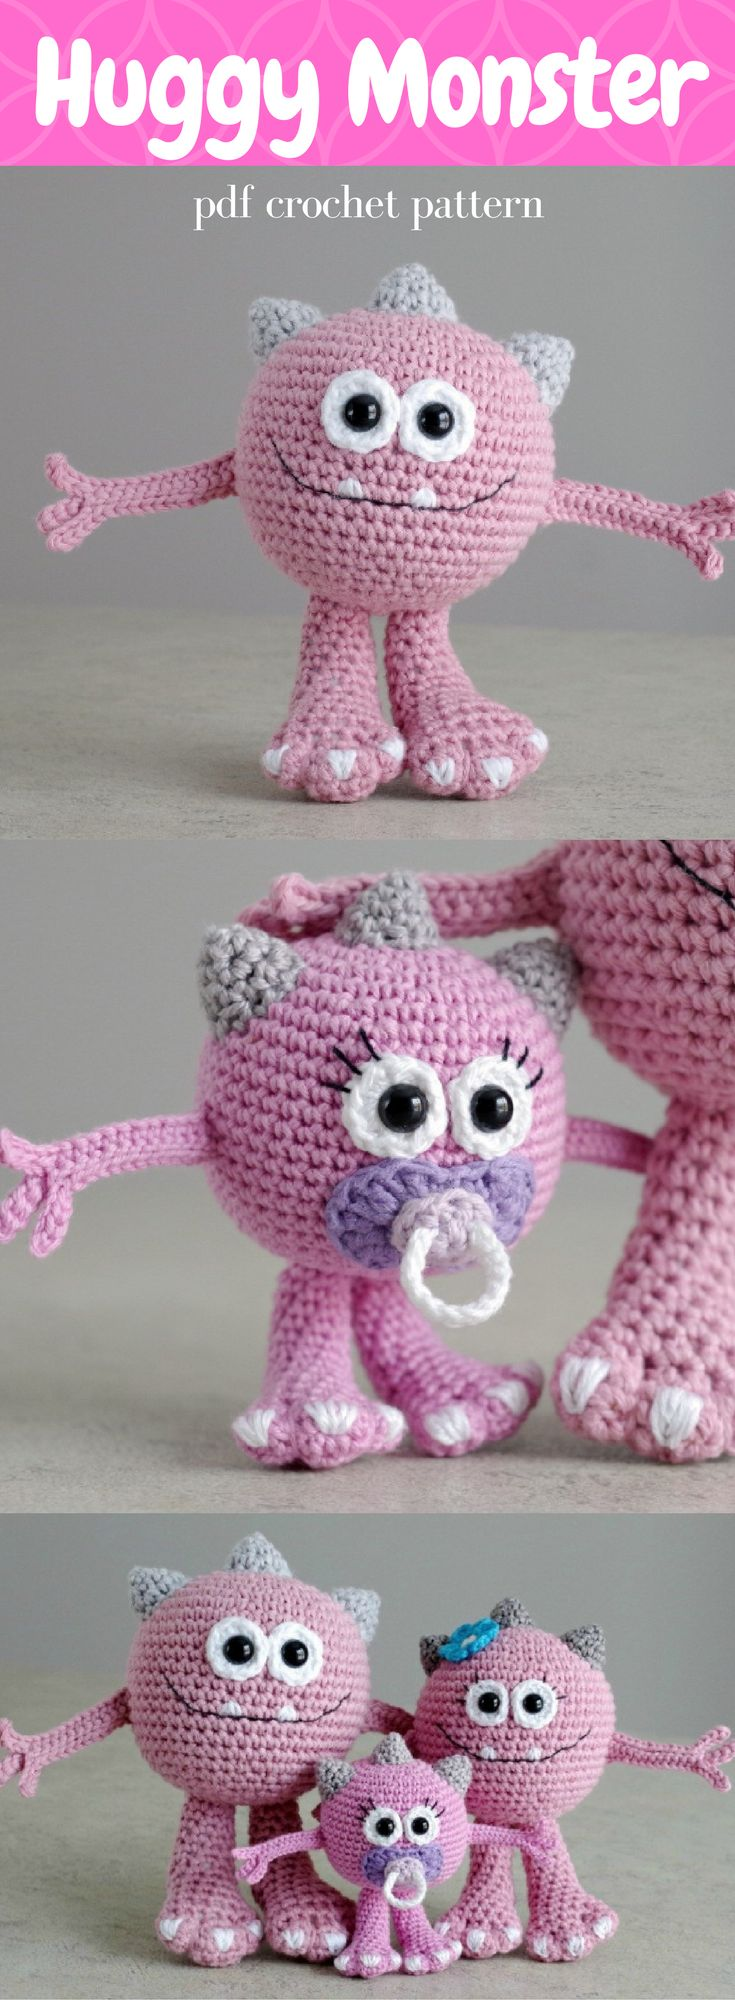 5495 best amigurumi images on pinterest amigurumi patterns cute monster family fandeluxe Image collections